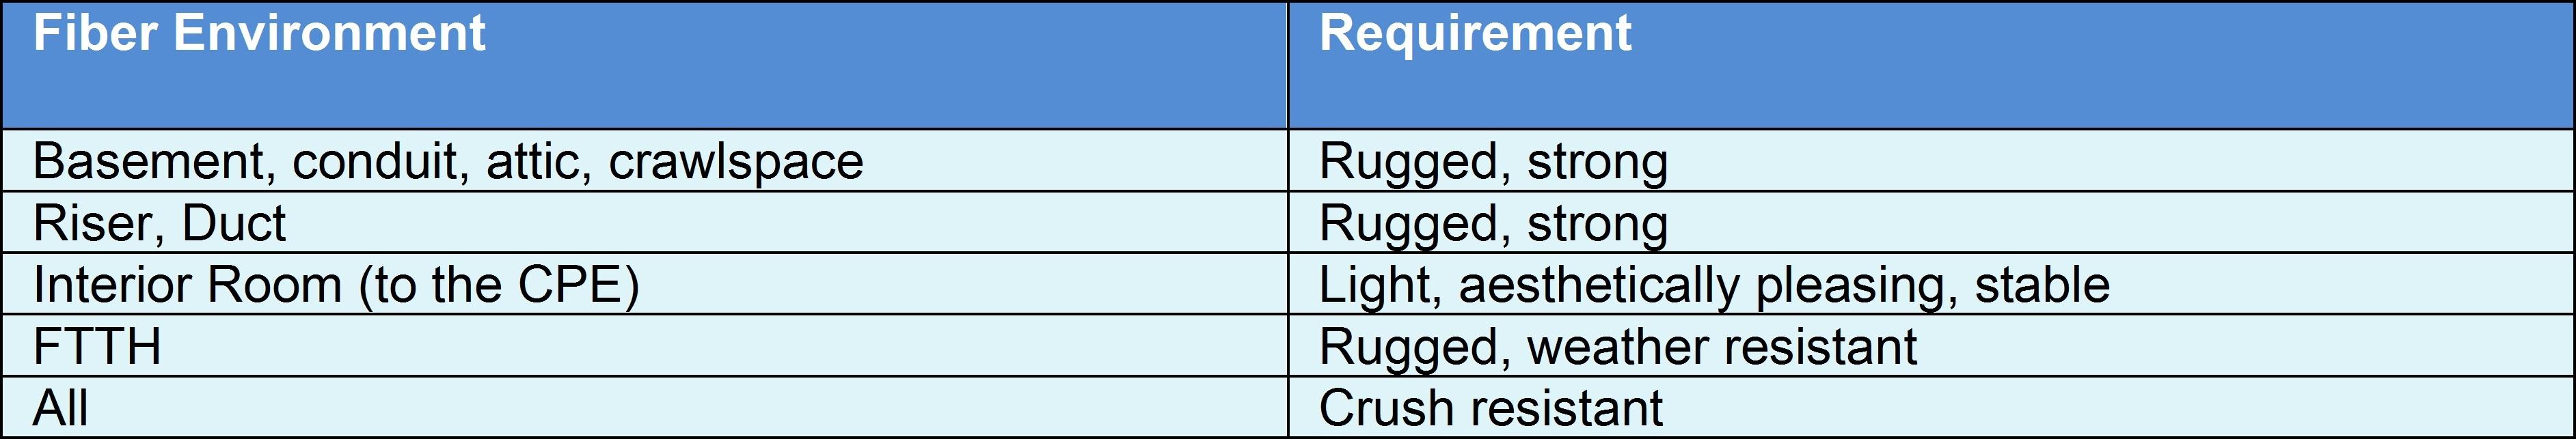 table2_1.jpg